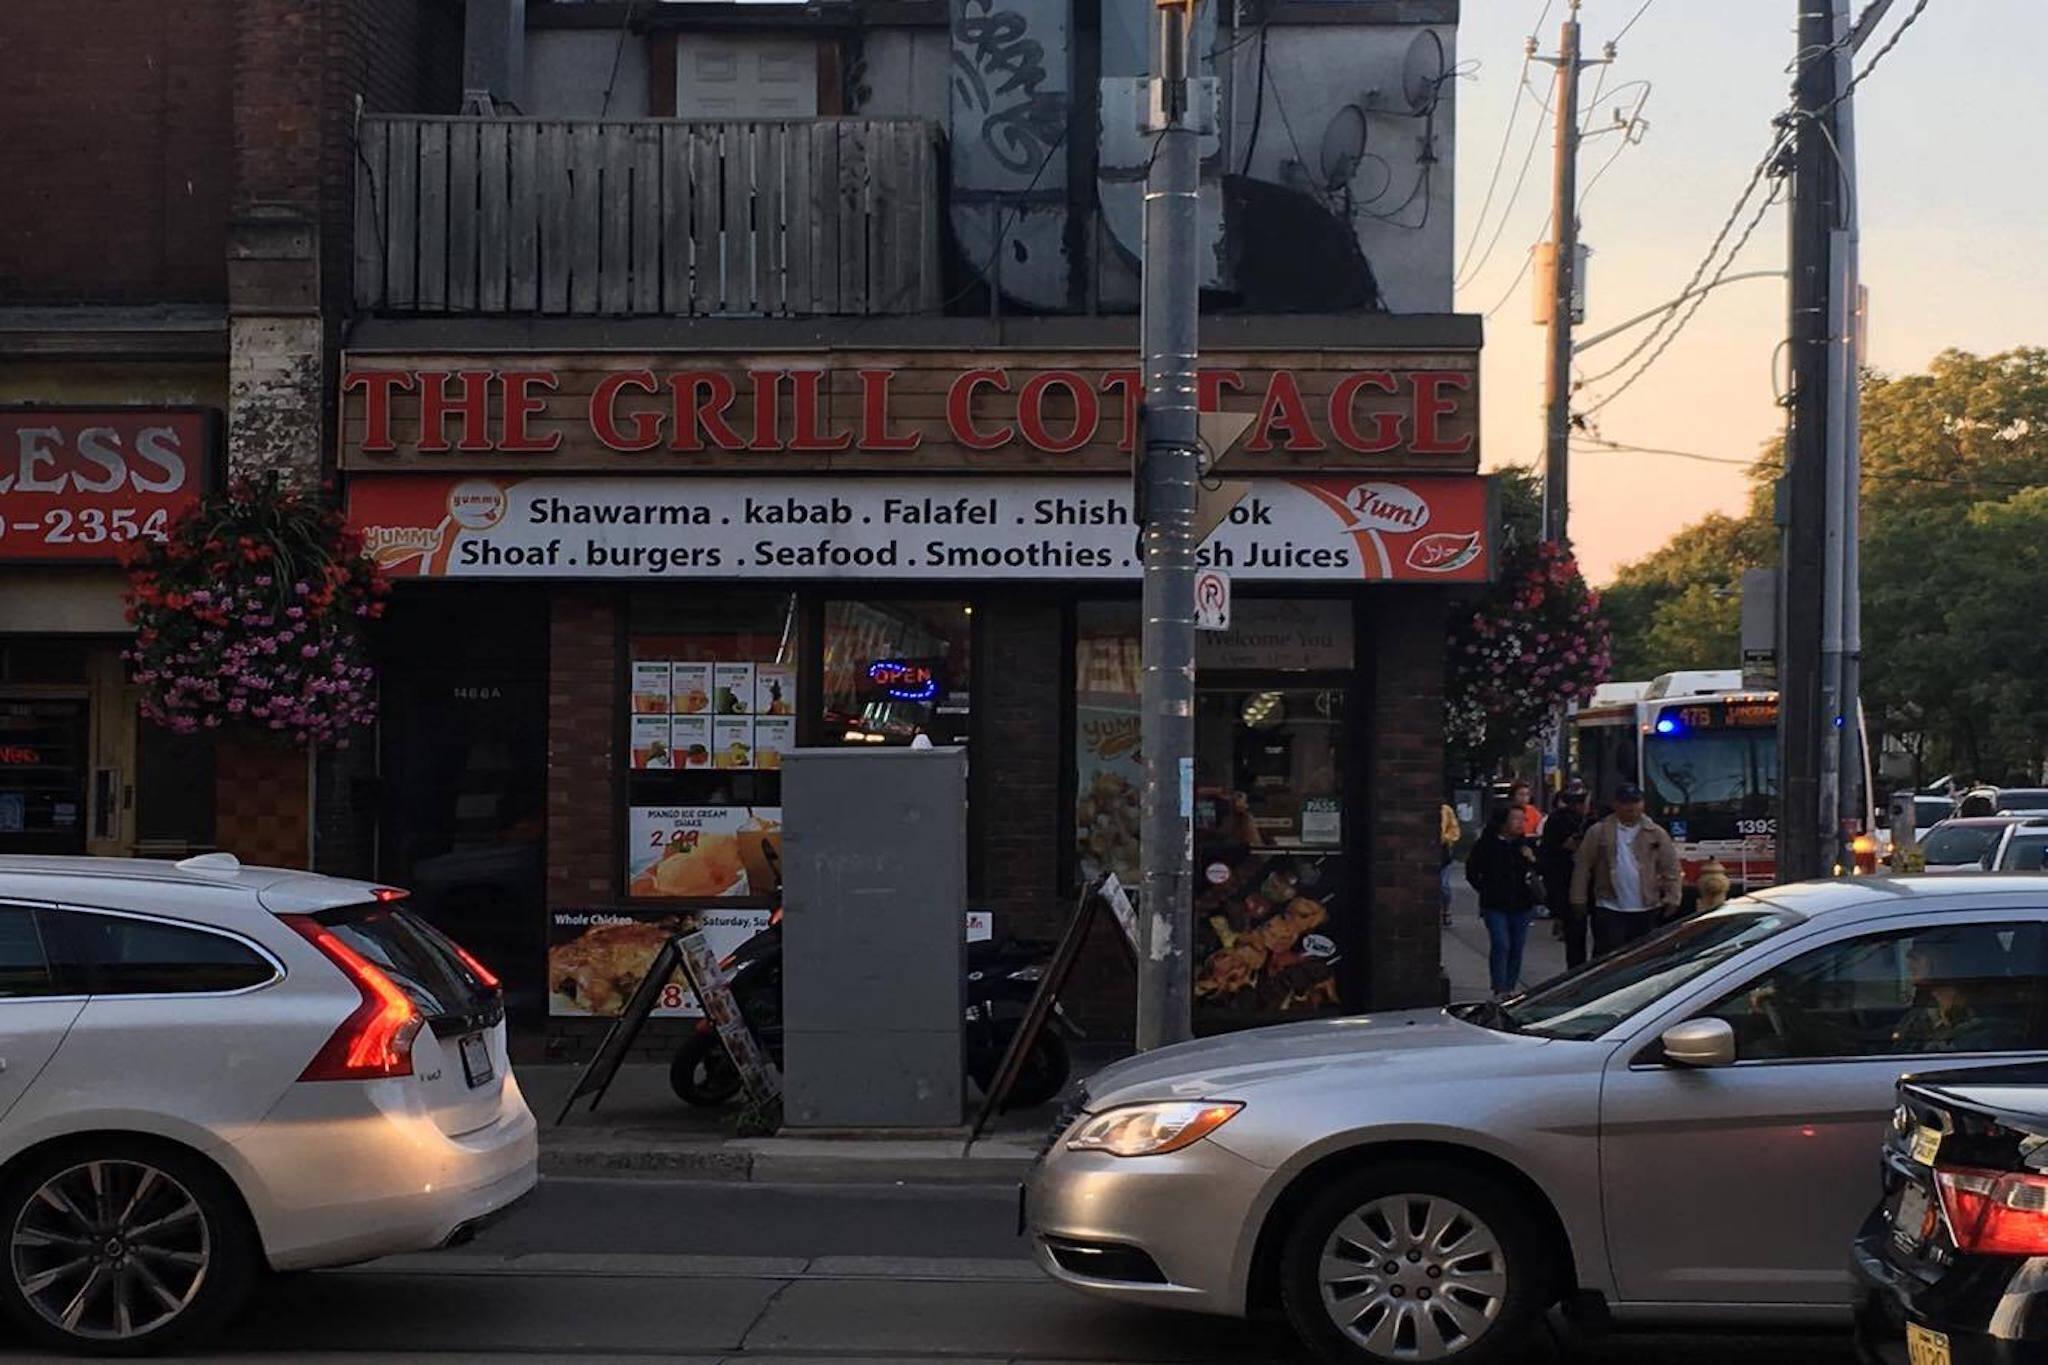 Grill cottage Toronto